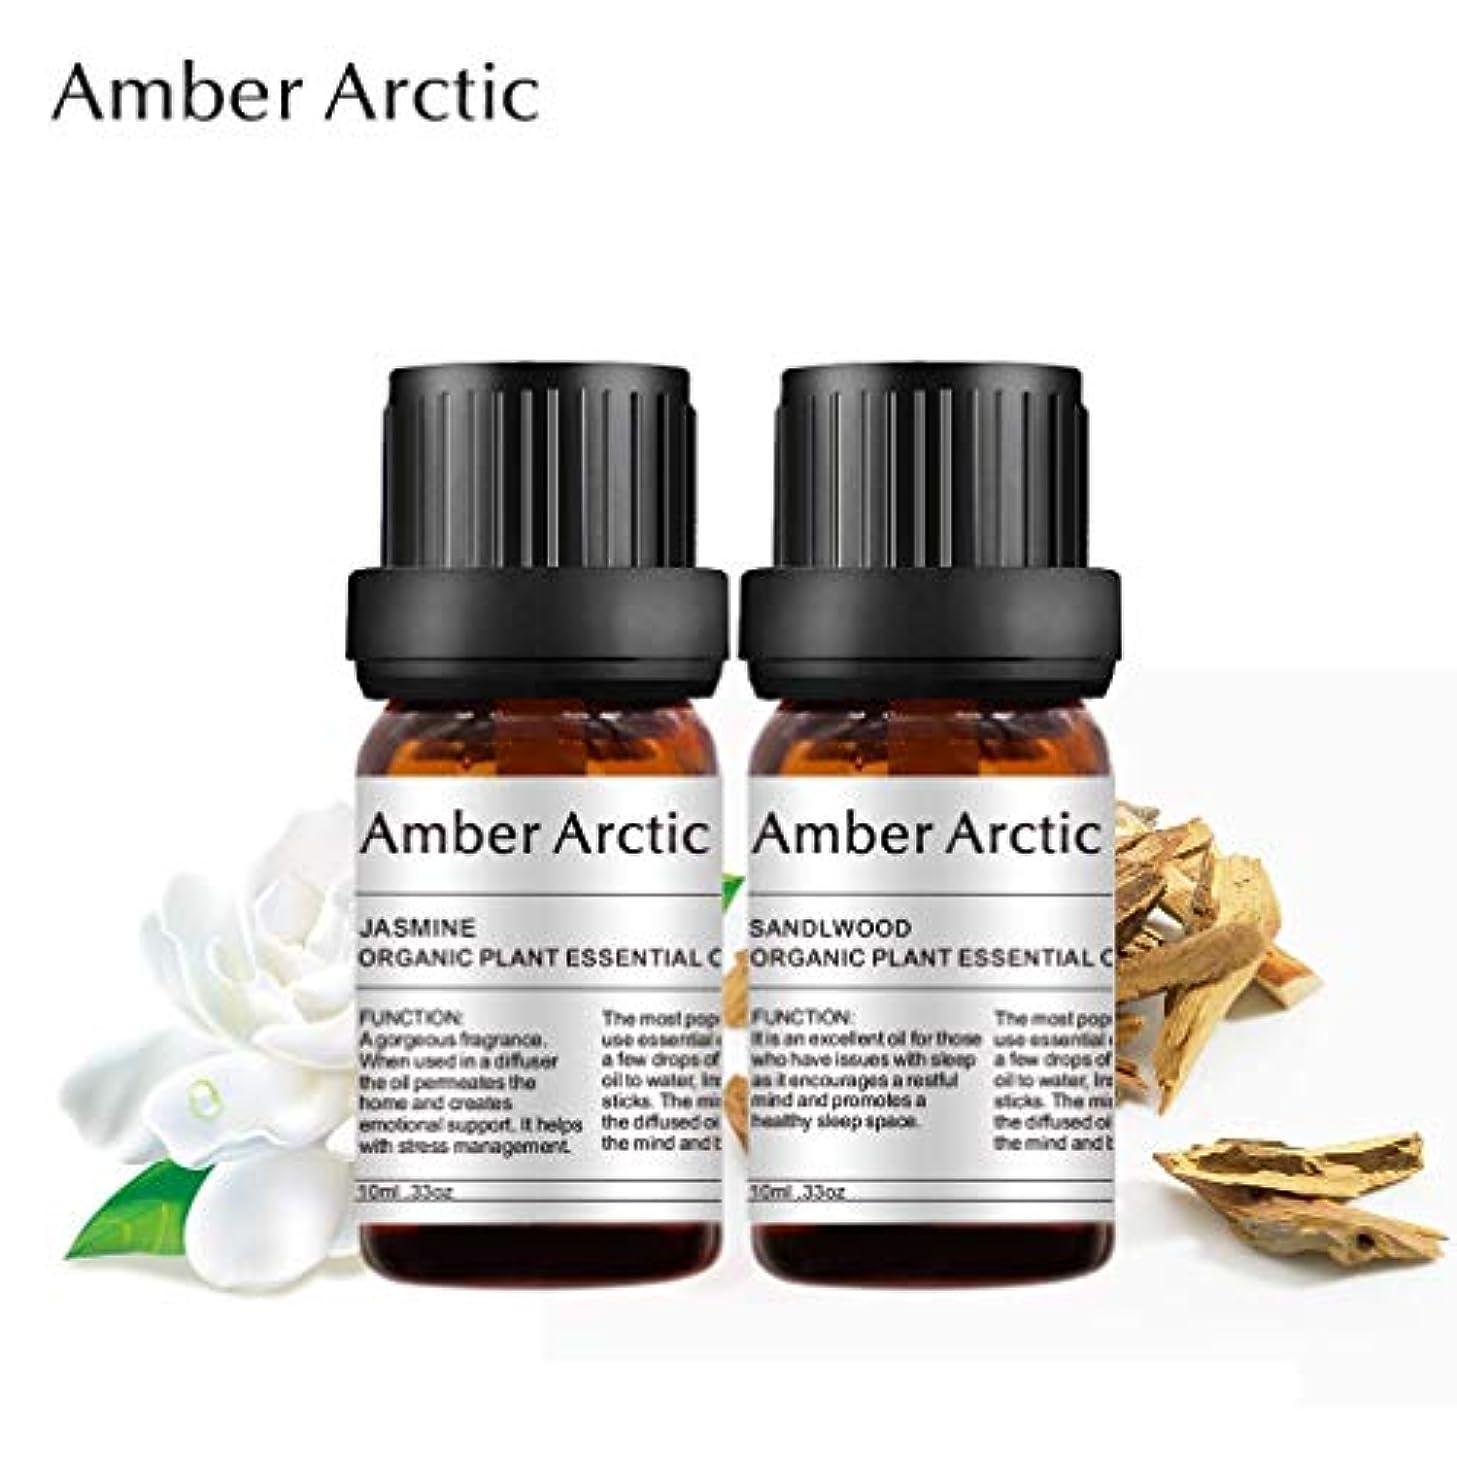 Amber Arctic ジャスミン ビャクダン 精油 セット、 ディフューザ 2×10 ミリリットル 100% 純粋 天然 アロマ エッセンシャル オイル